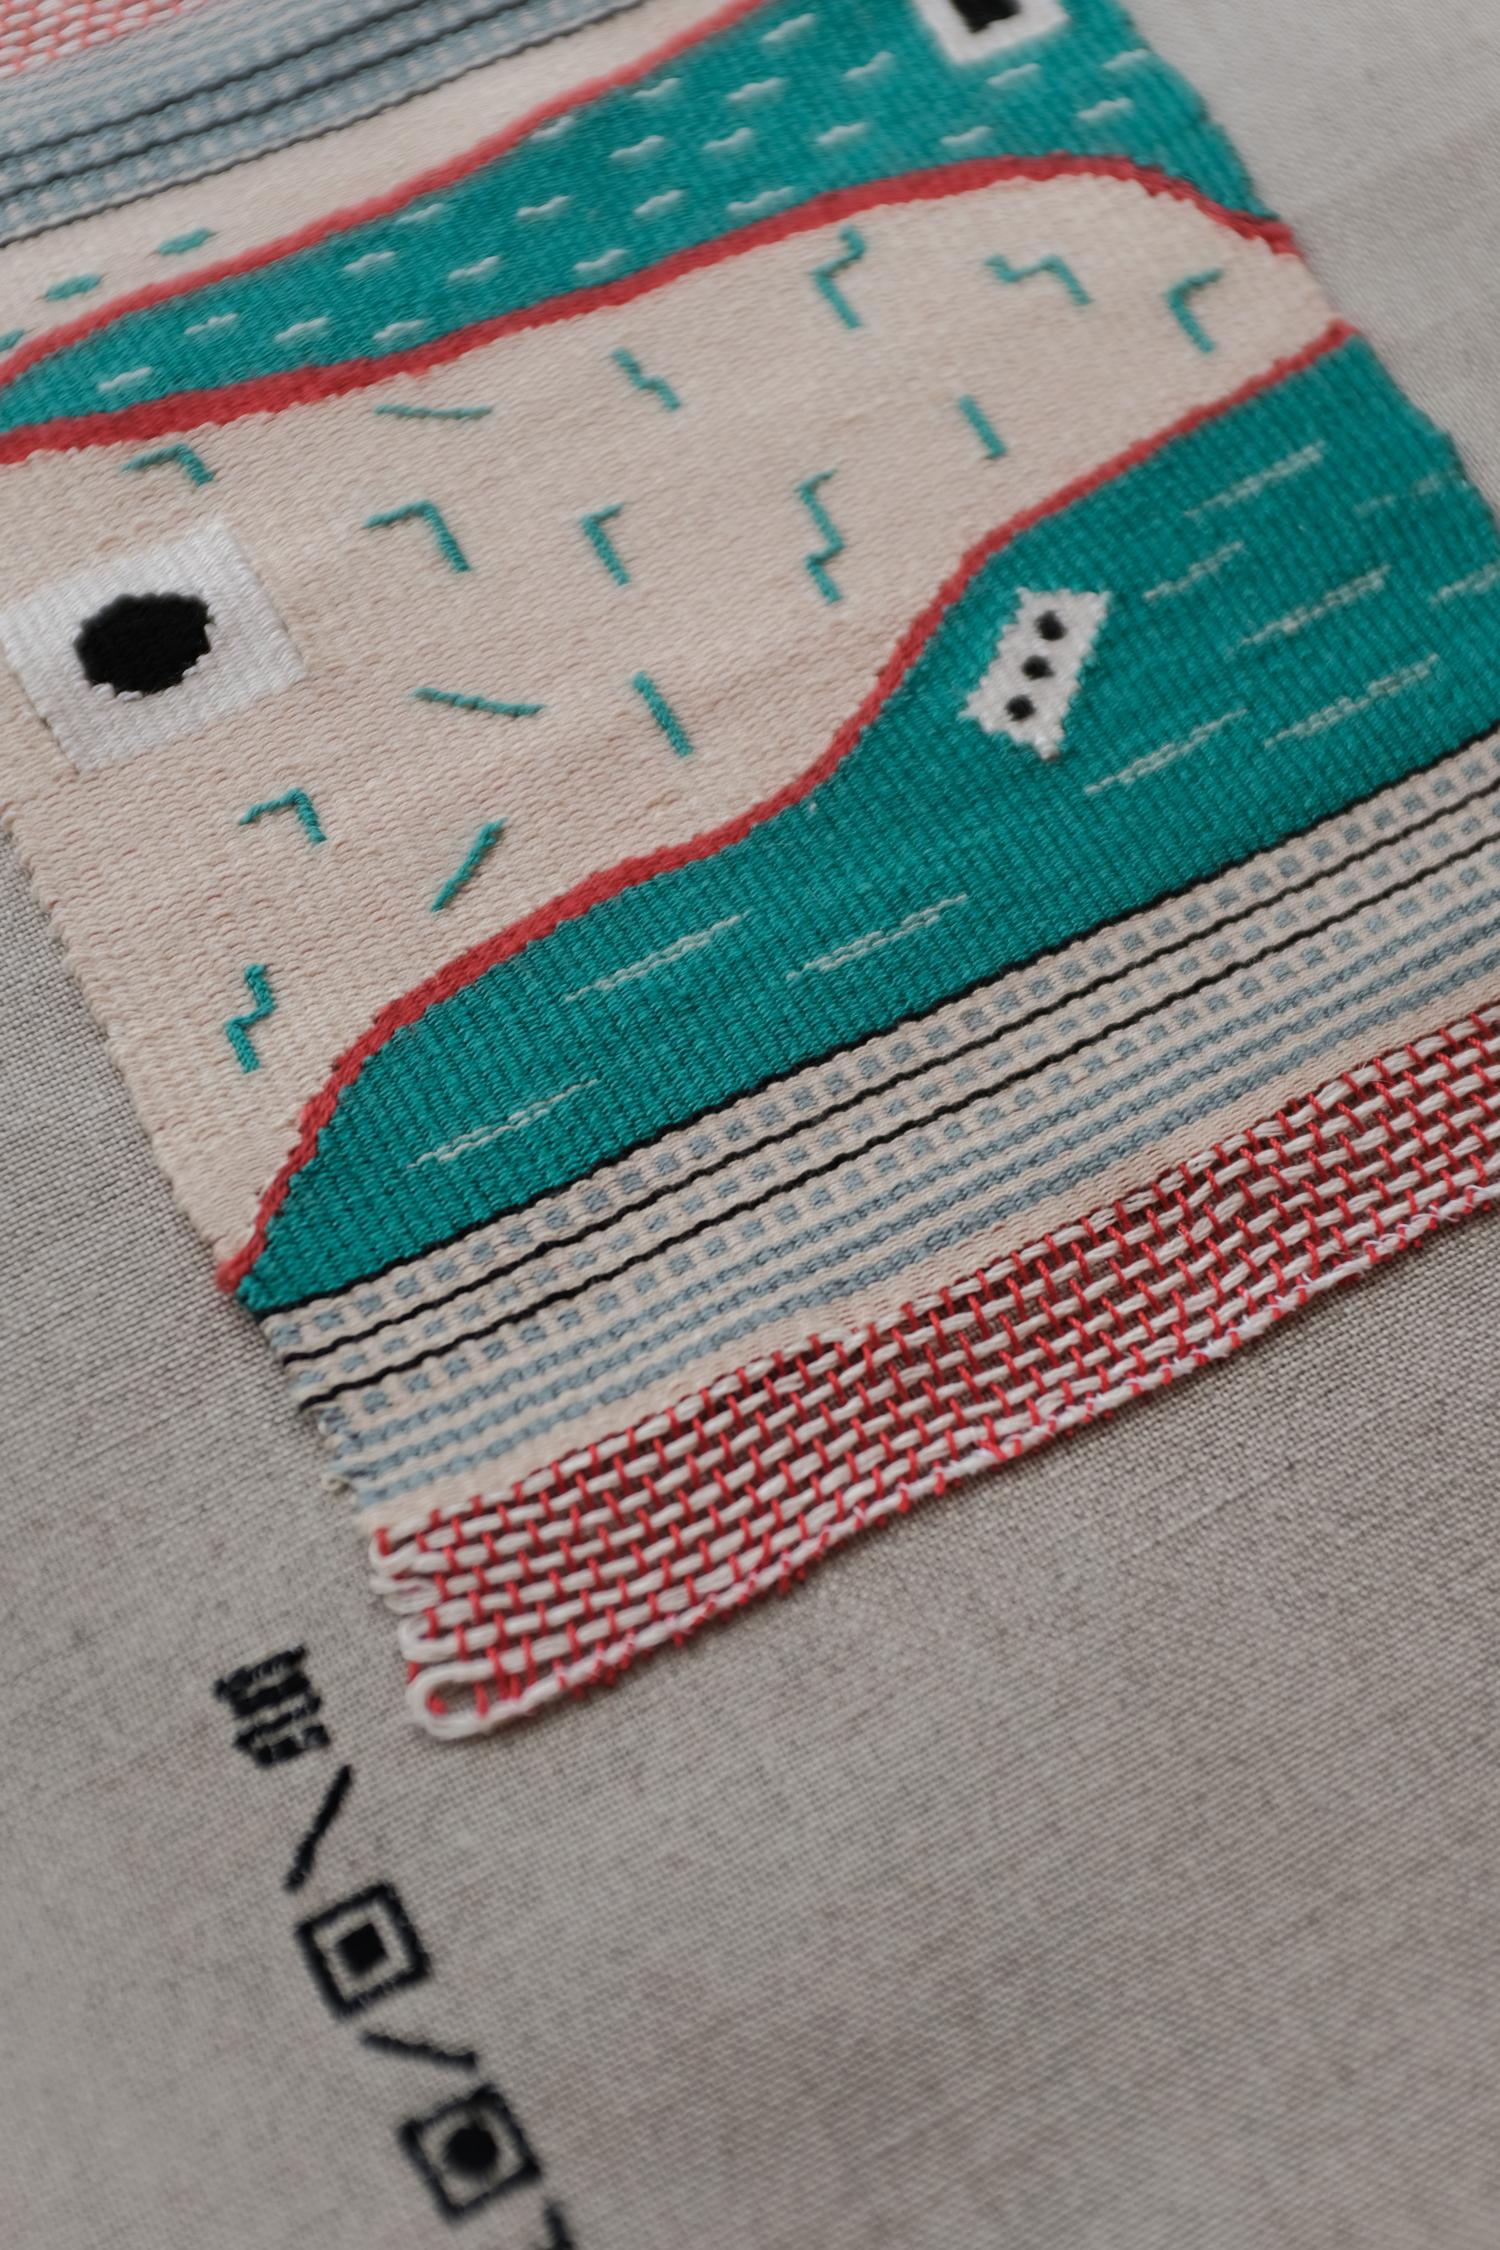 Baja Weaving series – Desert Drive 2